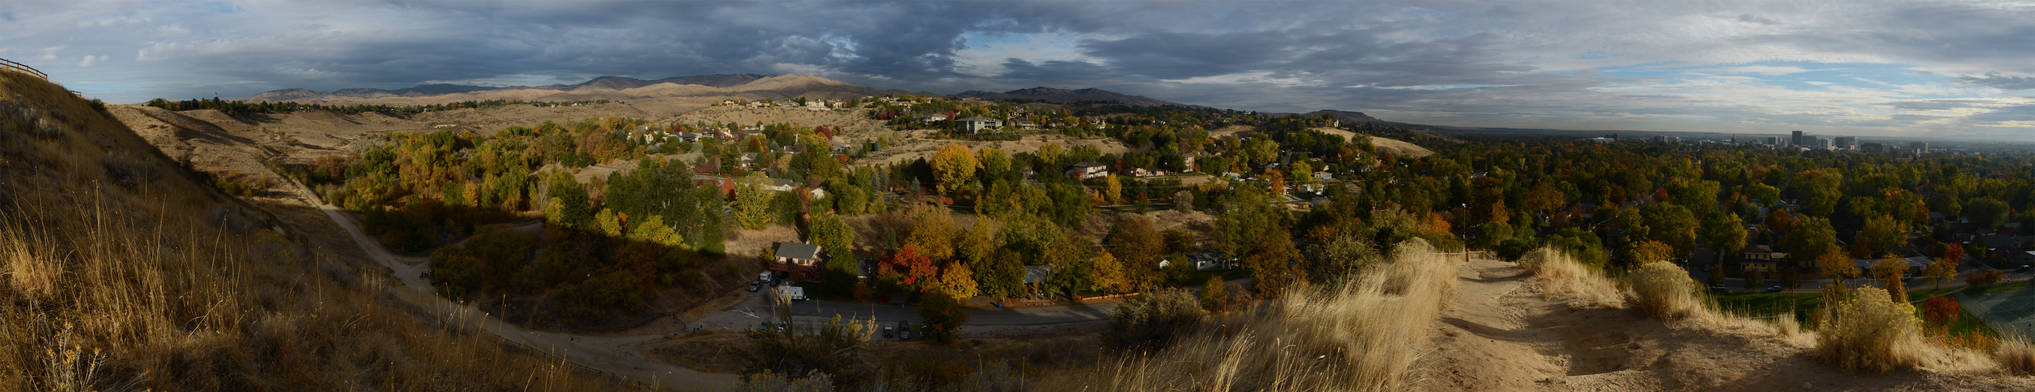 Camelback Park Fall 2012-10-19 3